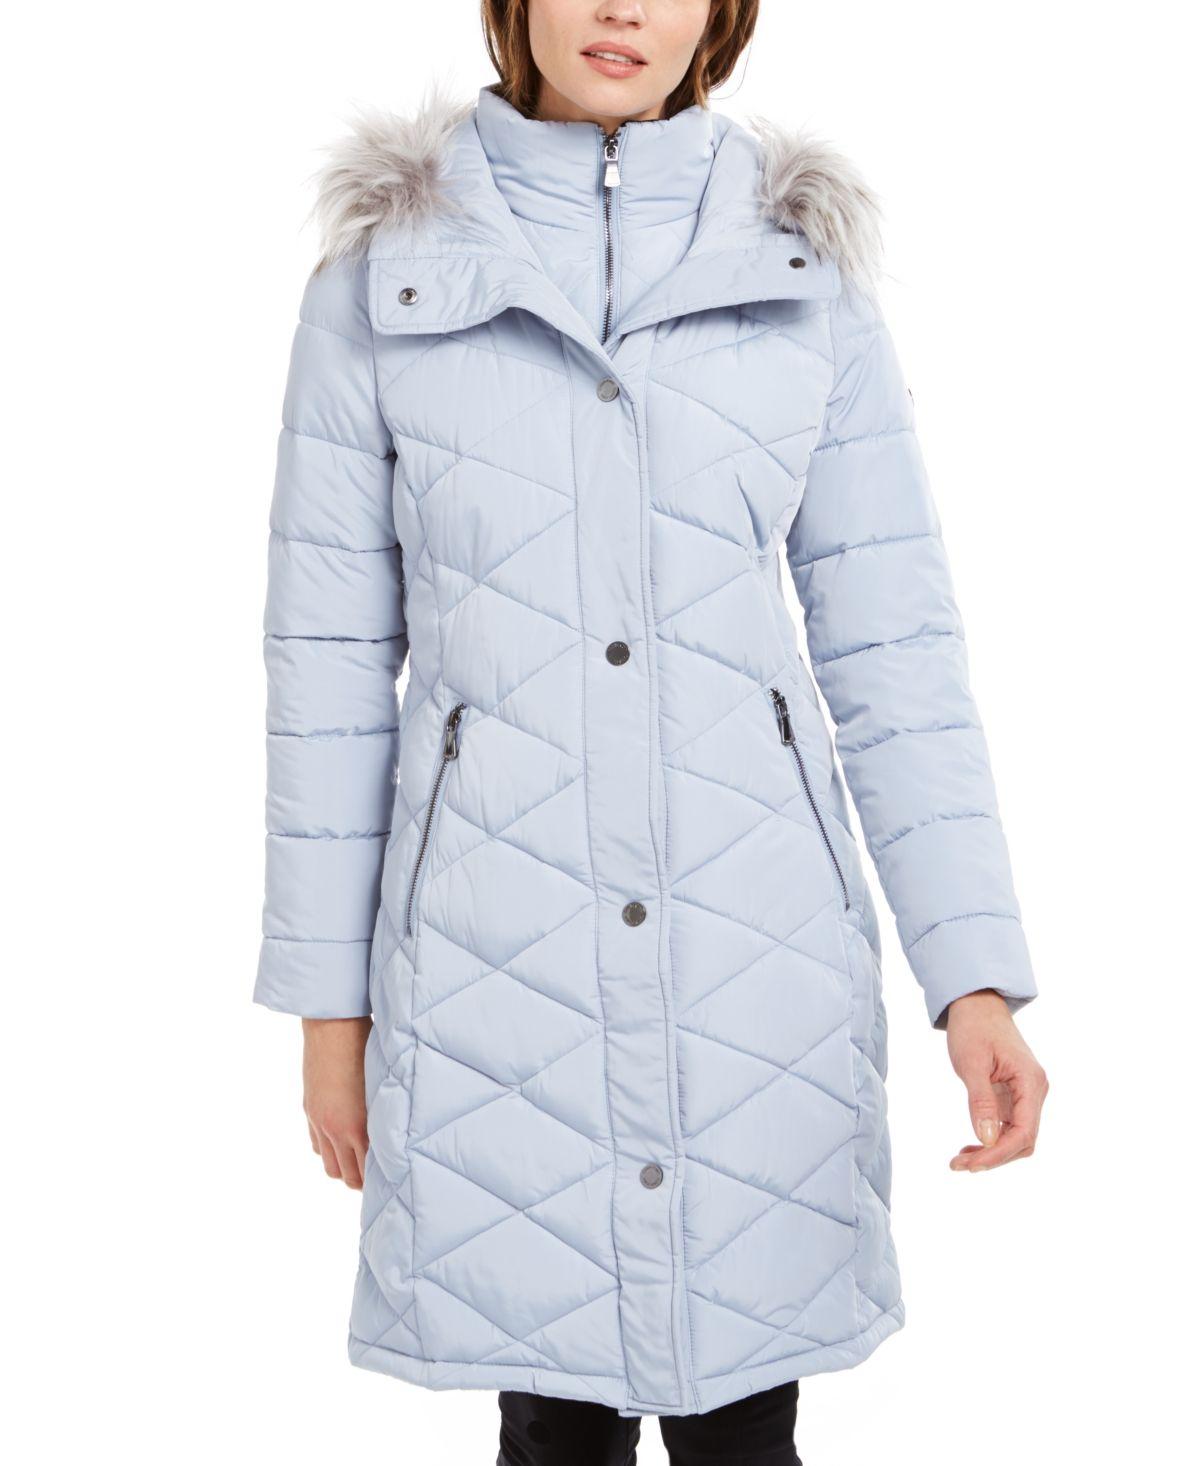 Calvin Klein Diamond Quilt Faux Fur Trim Hooded Puffer Coat Reviews Coats Women Macy S Leggings Are Not Pants Puffer Coat Coat [ 1466 x 1200 Pixel ]